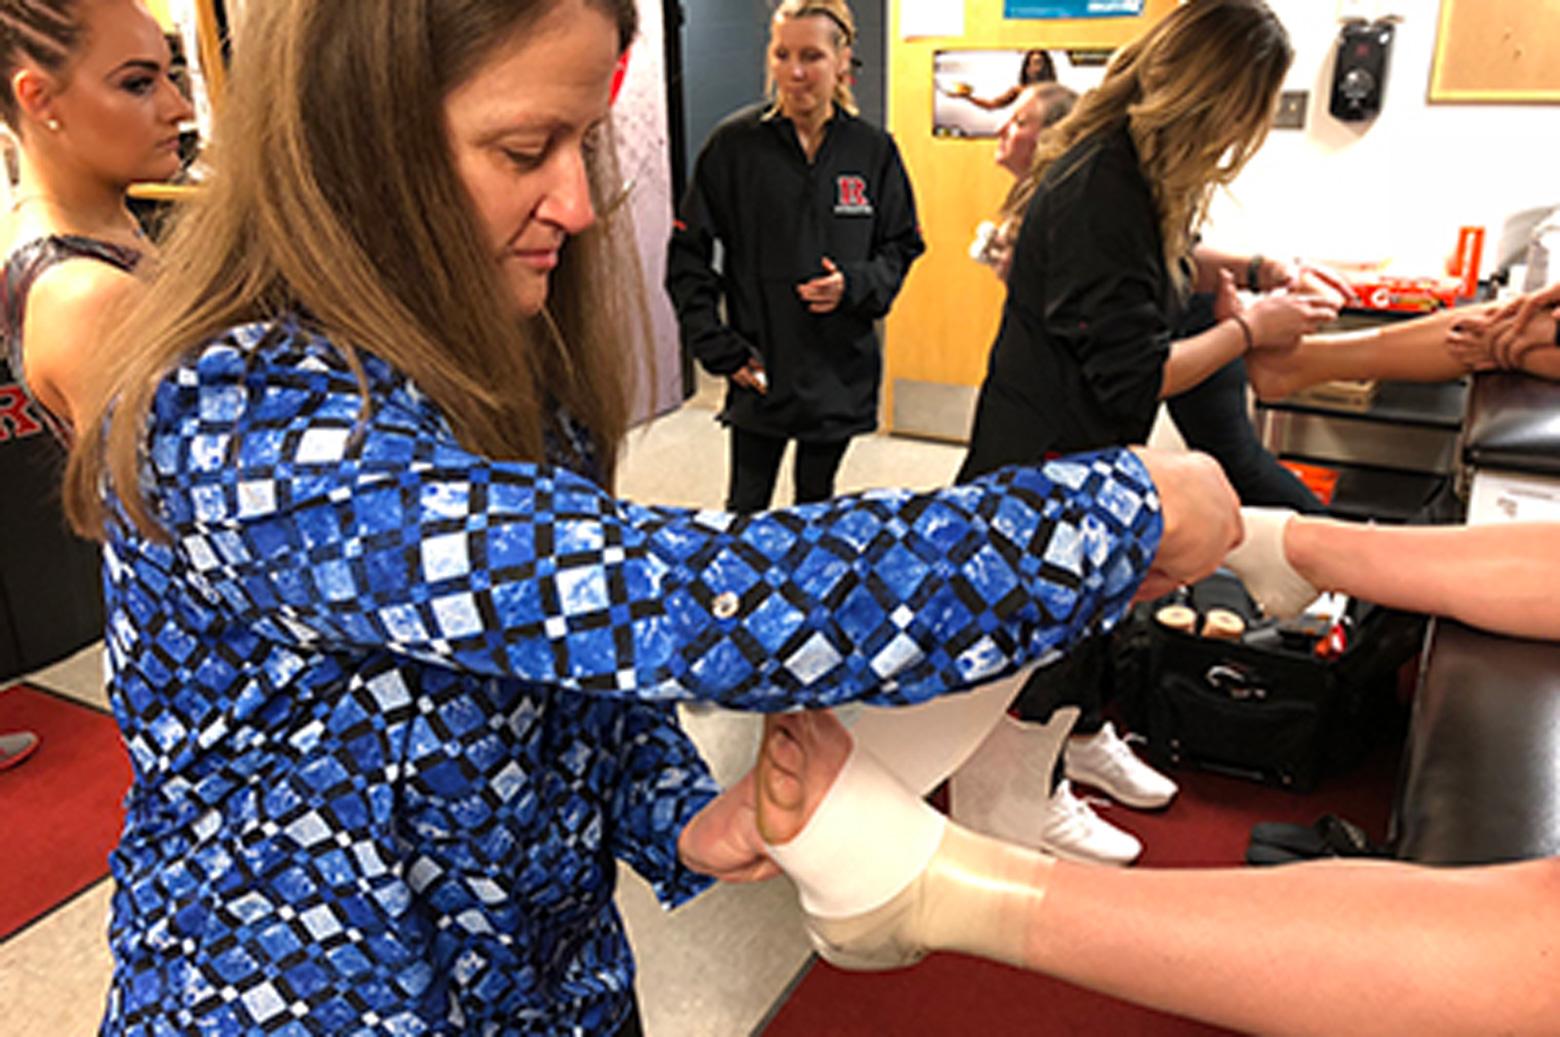 Athletic trainer wraps athlete's foot